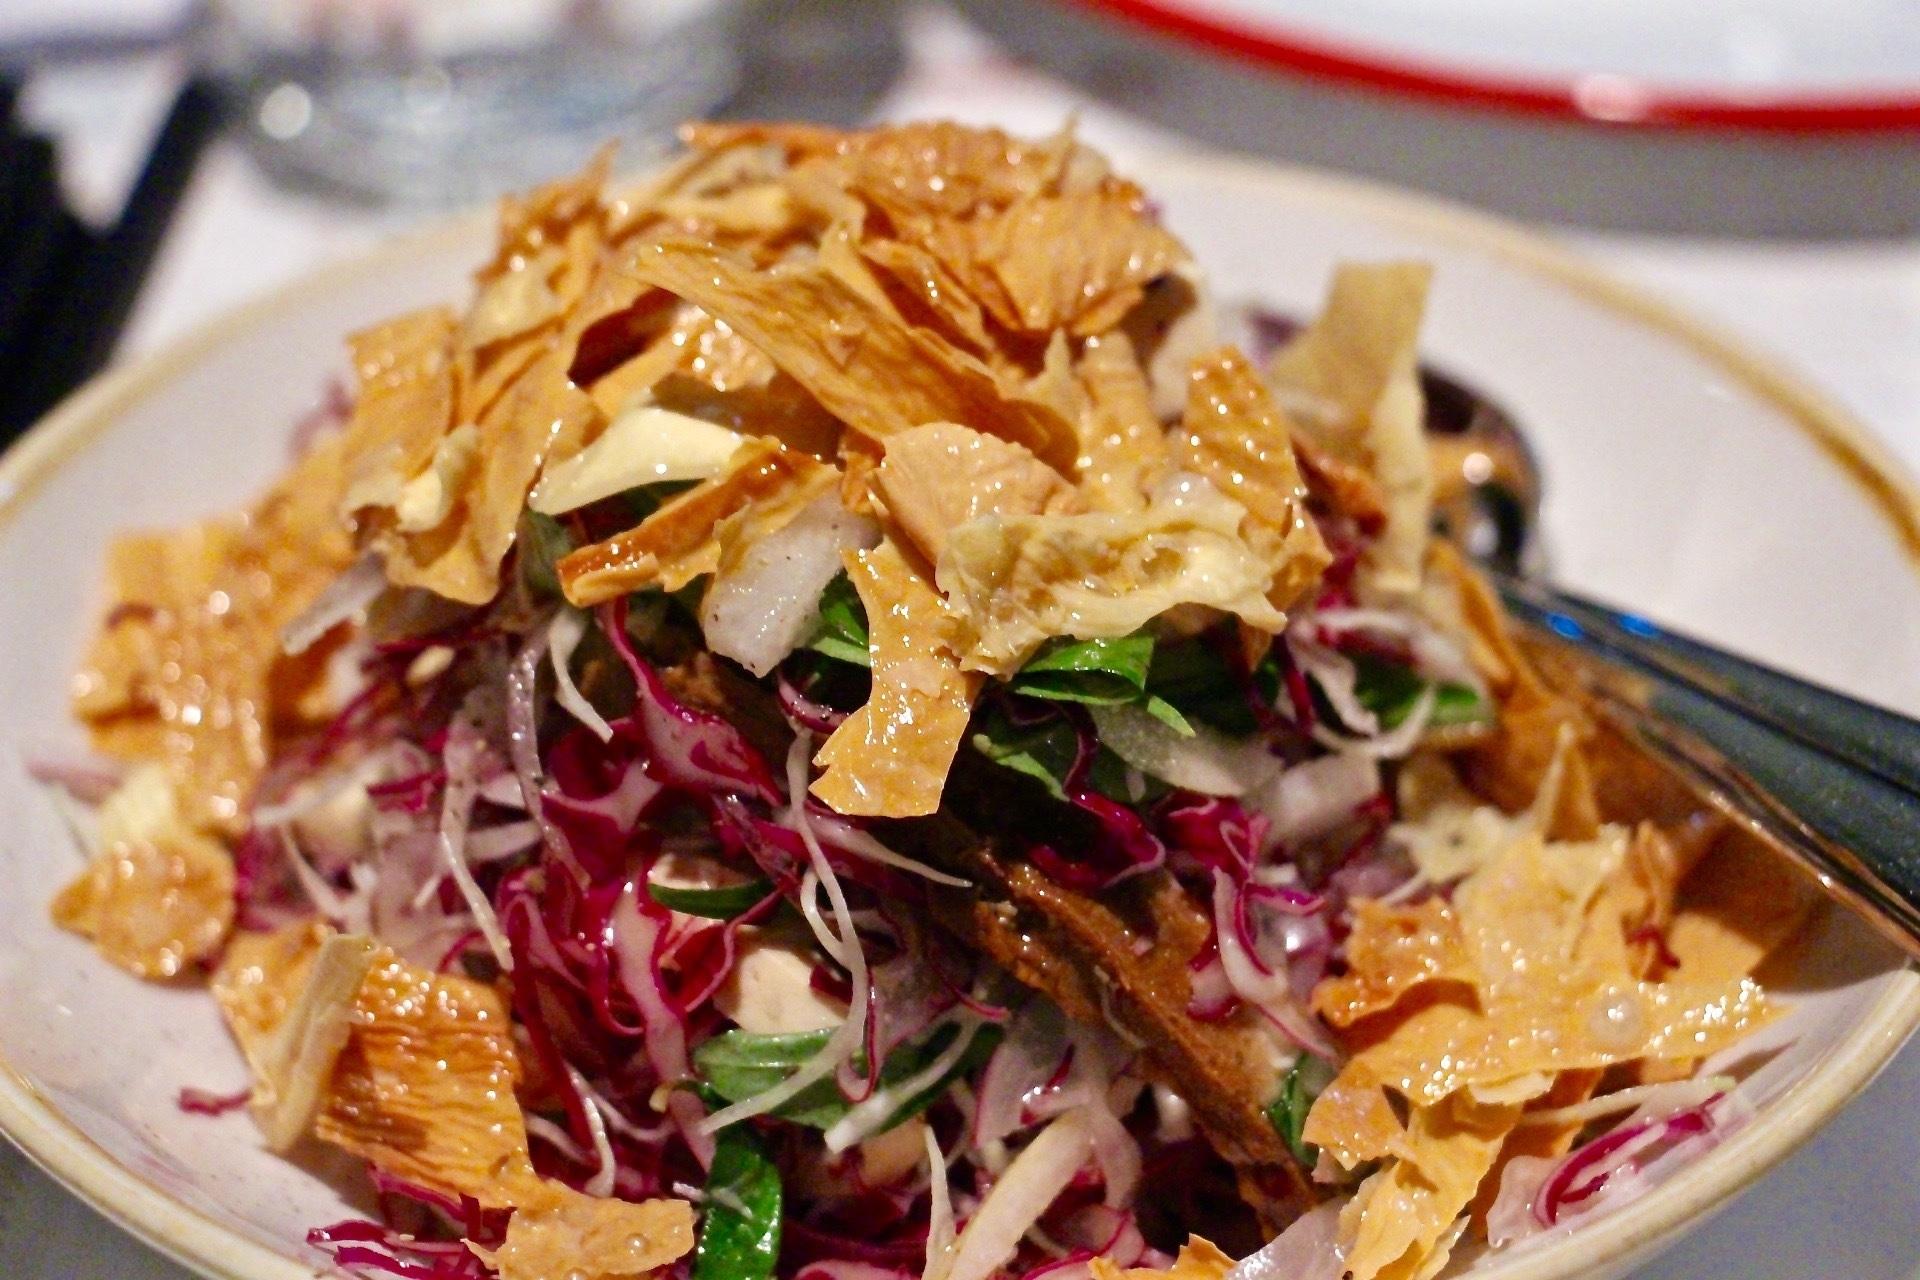 Le Garcon Saigon salad